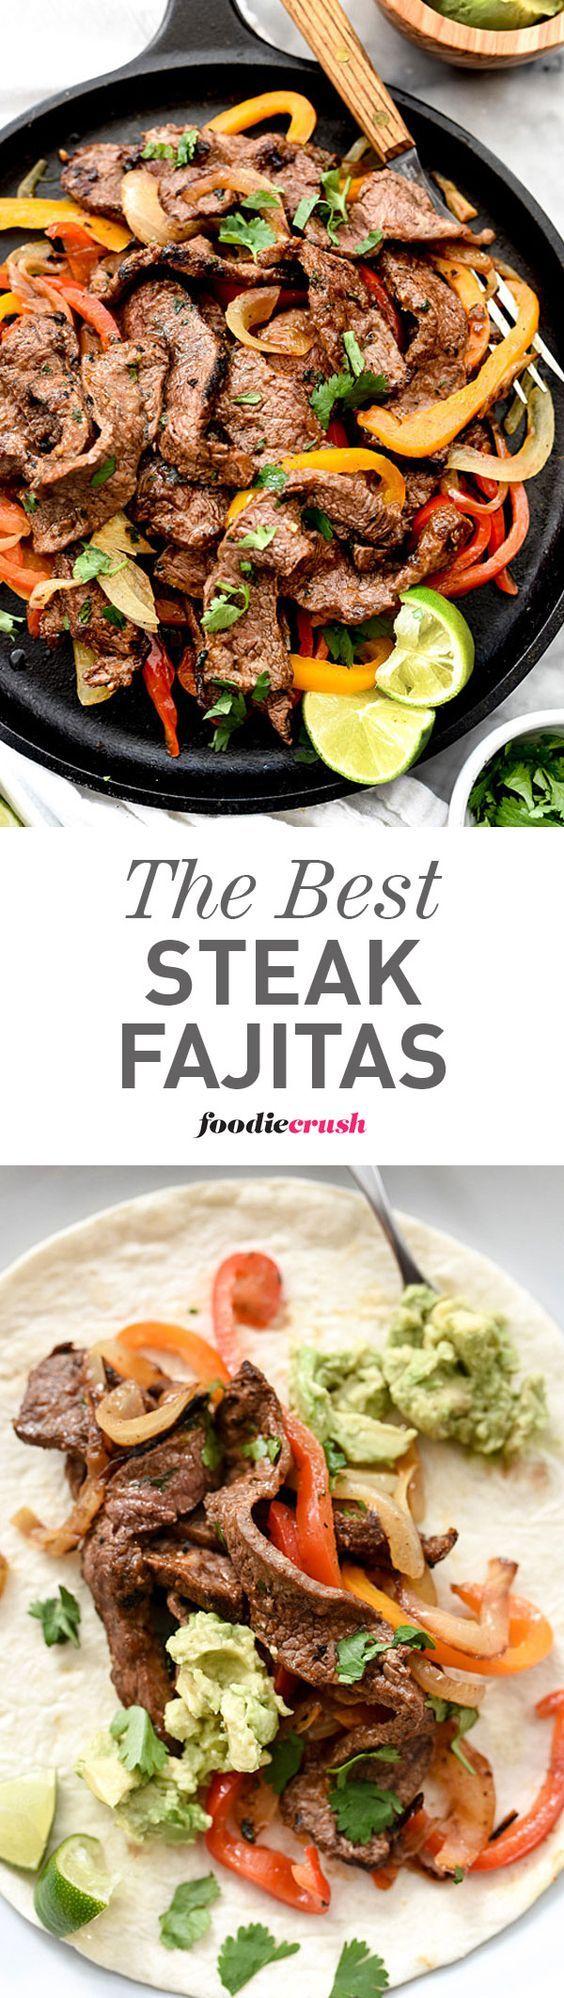 The homemade fajita spice mix is what makes these Steak Fajitas the best I've ever eaten